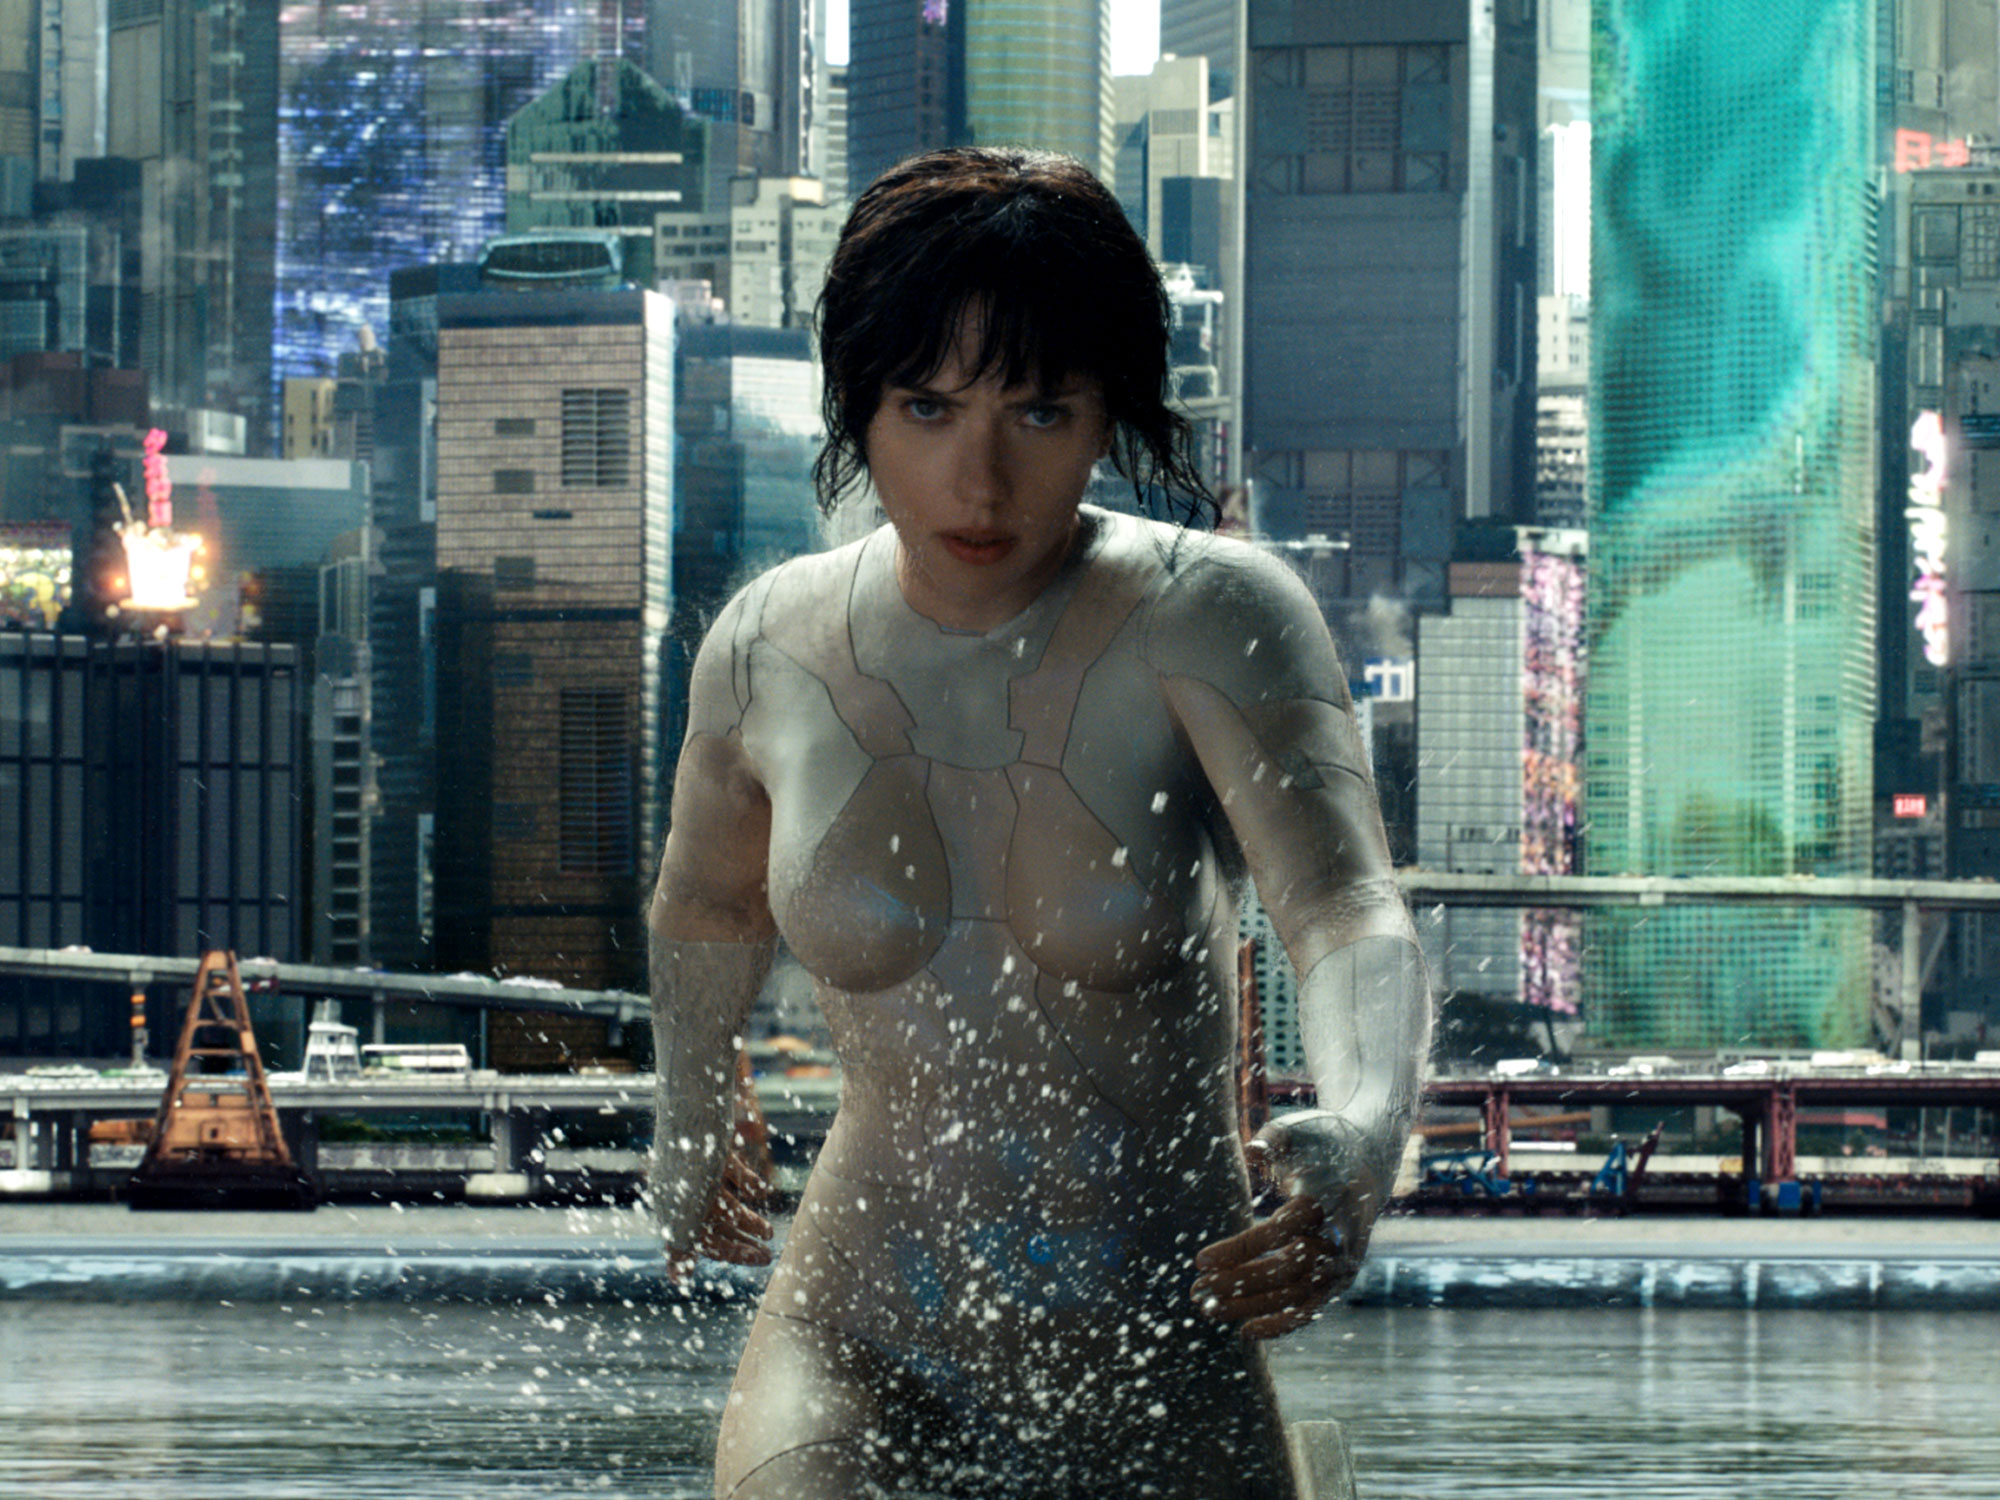 The Uncanny Disembodiment Of Scarlett Johansson